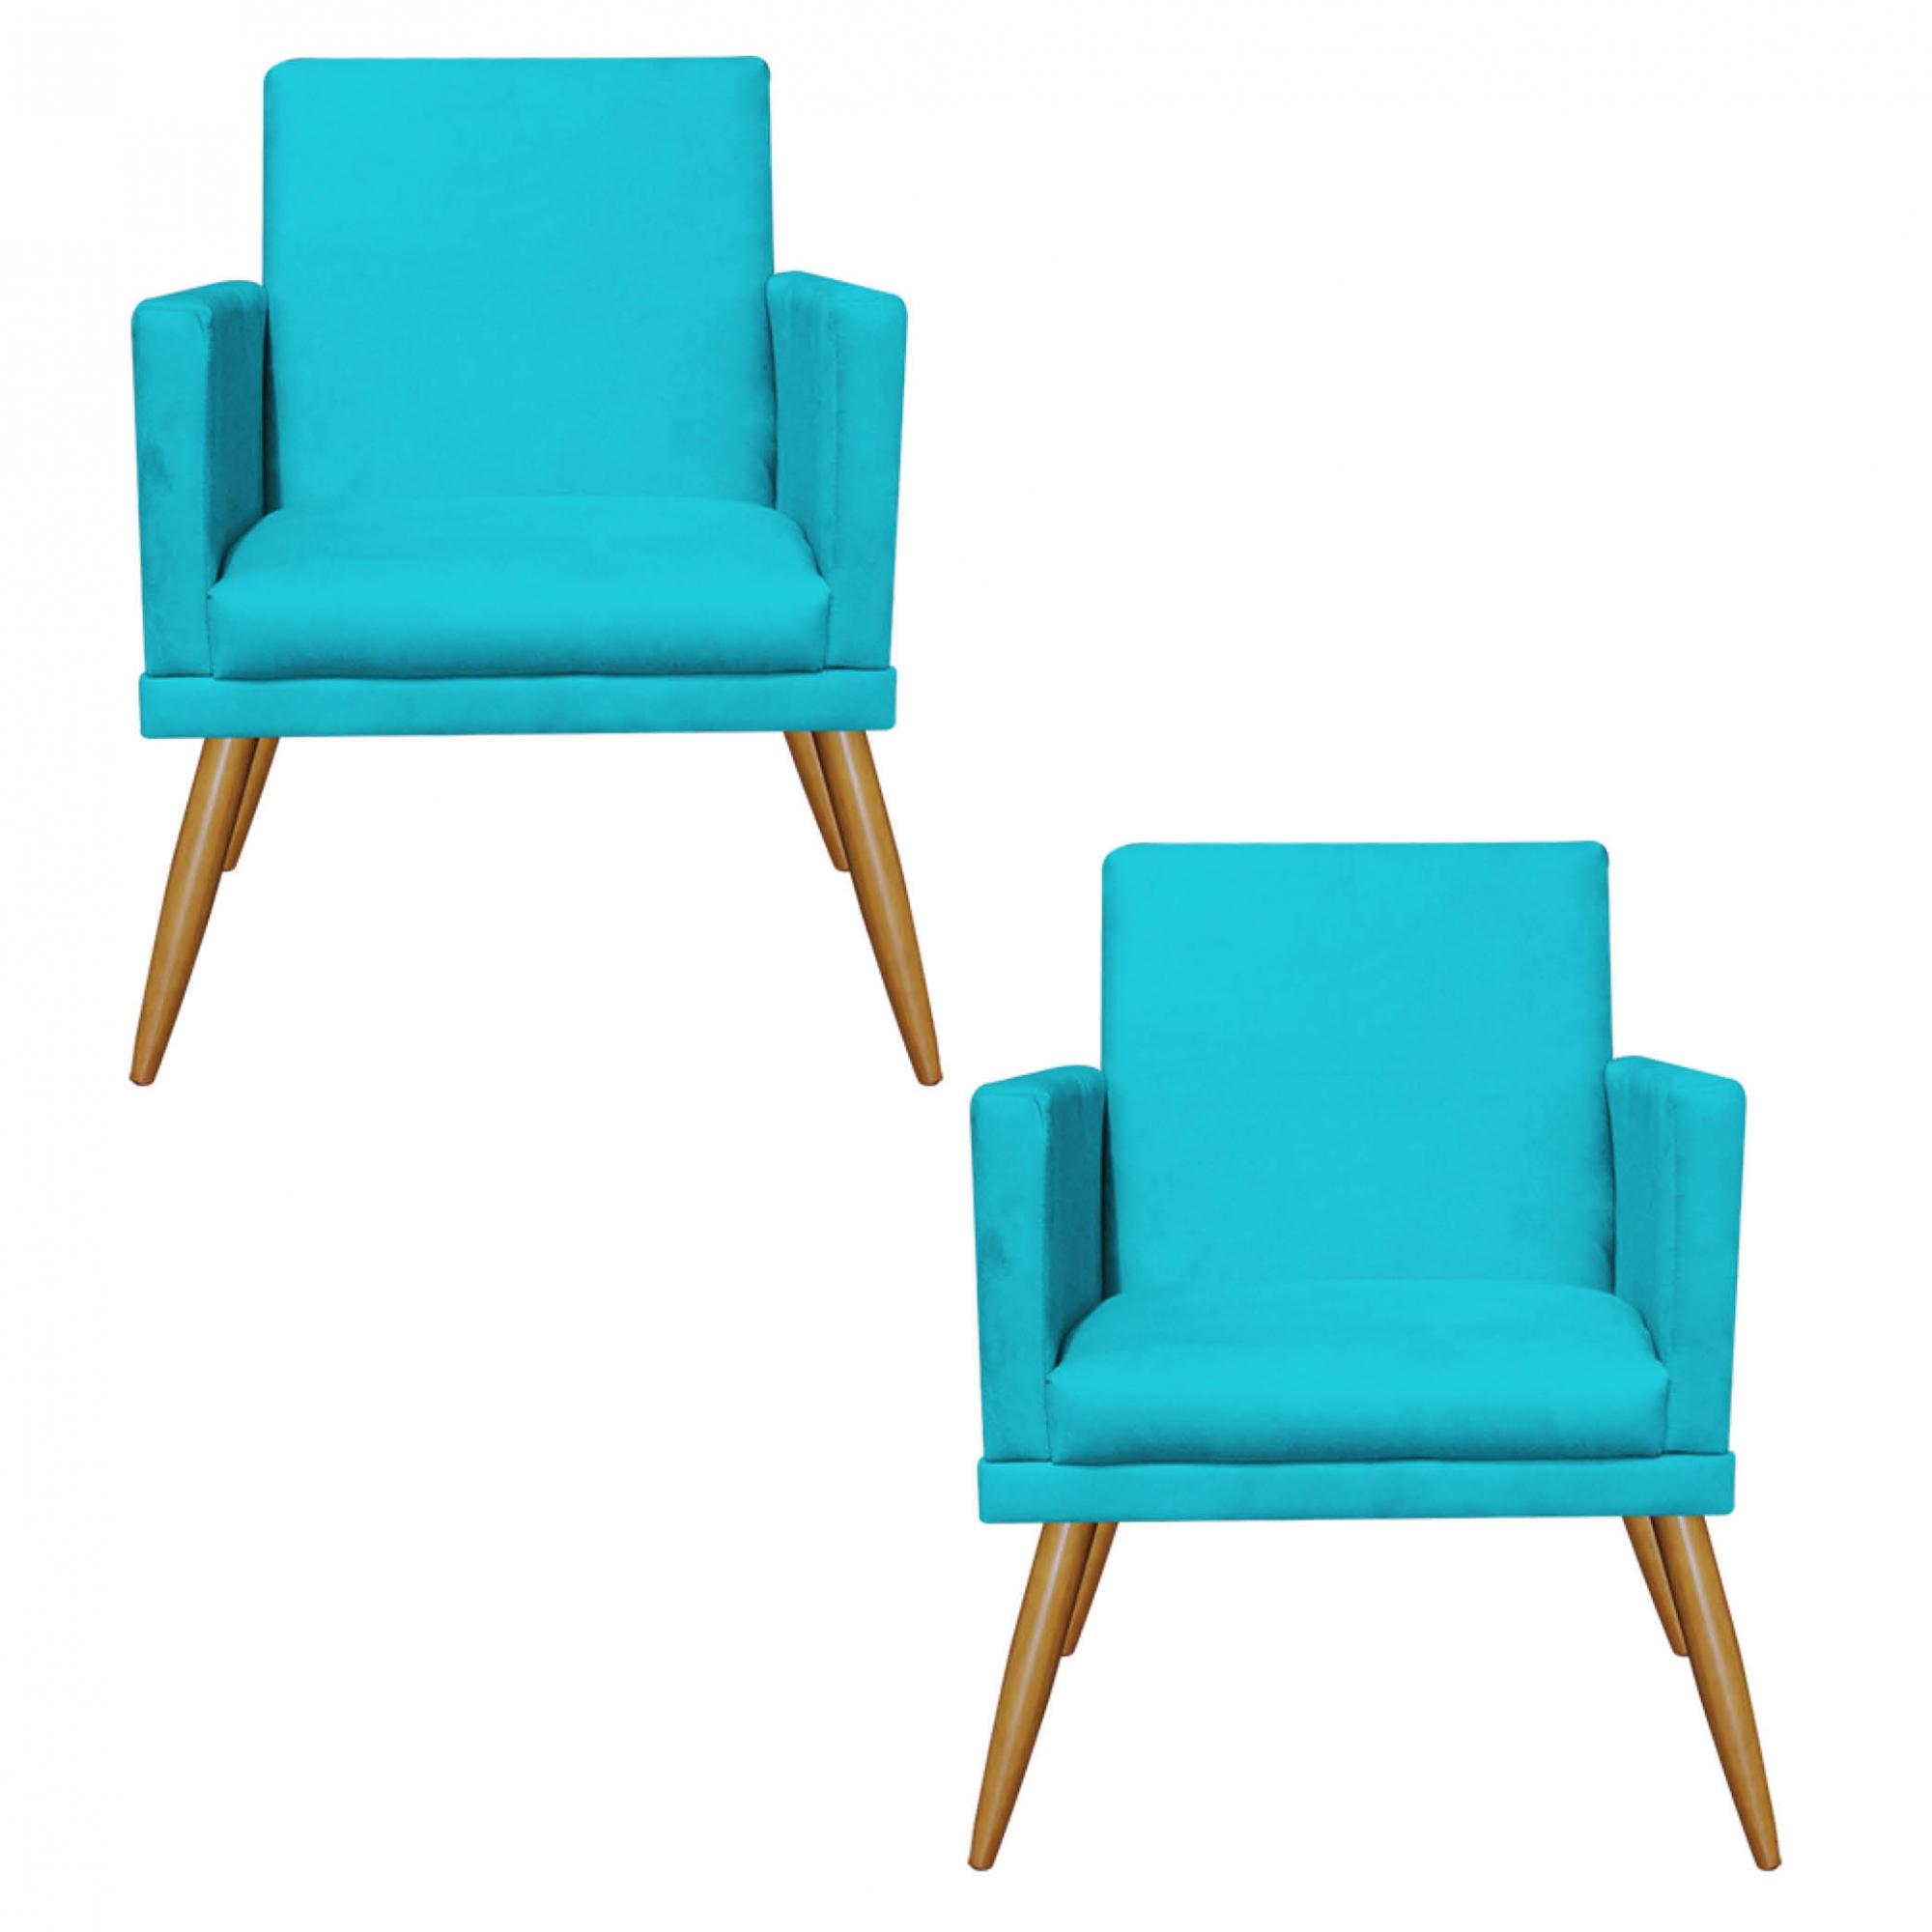 Kit 02 Poltrona Decorativa Nina com rodapé Azul - Bela Casa Shop